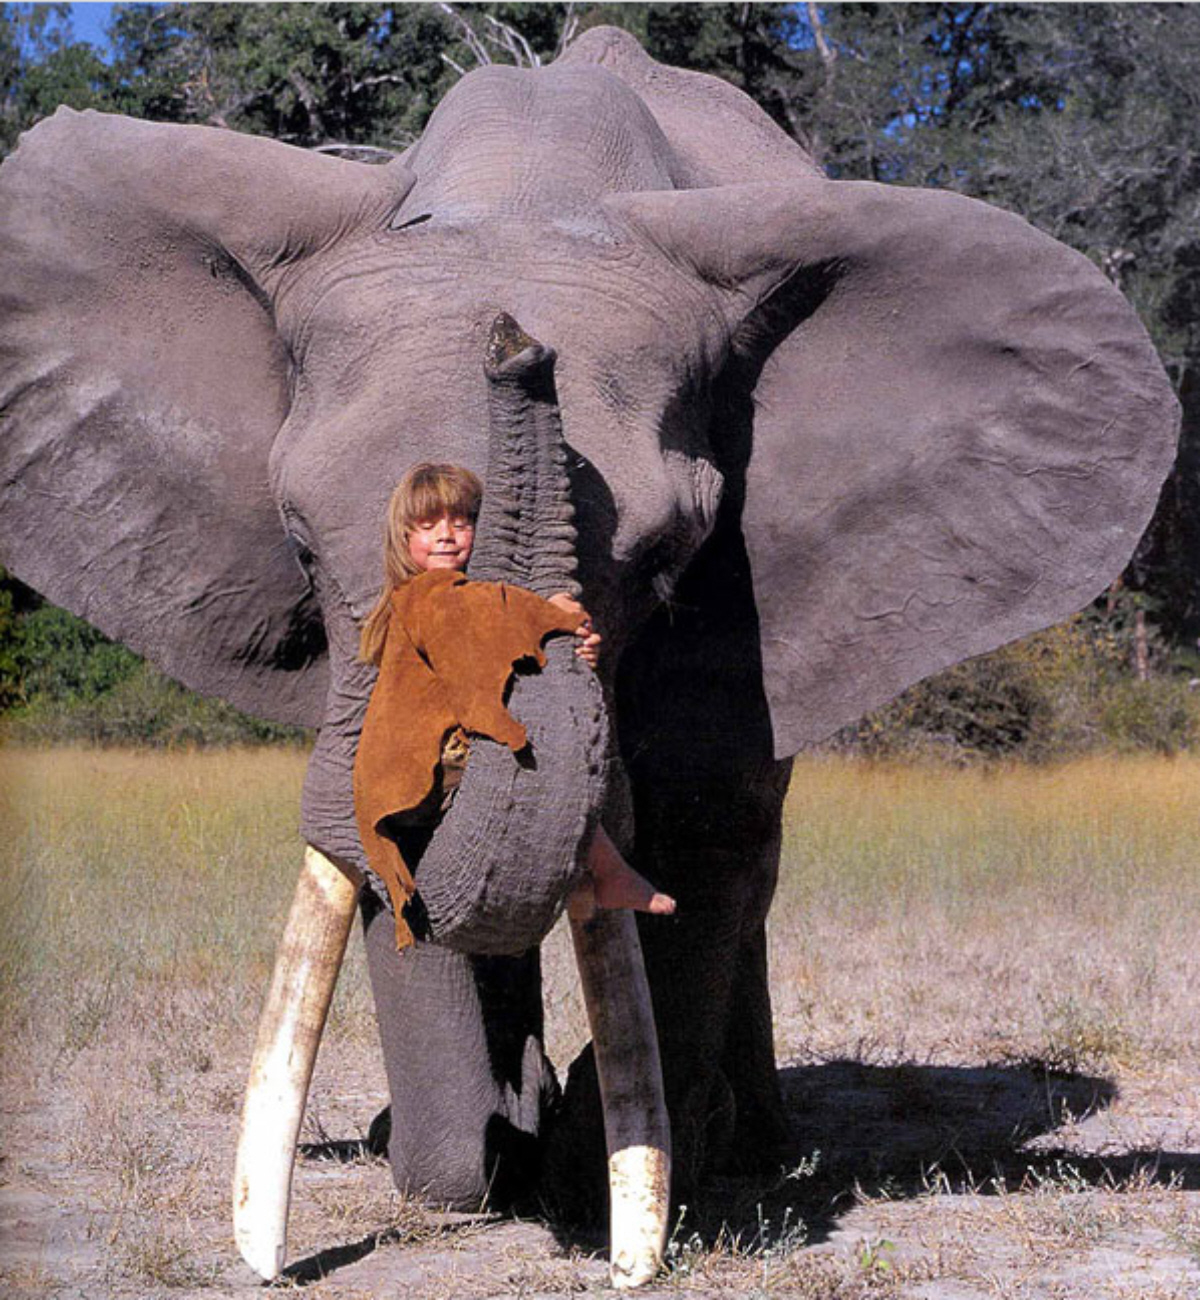 Tippi Degré, A Real Life Mowgli | Huckberry